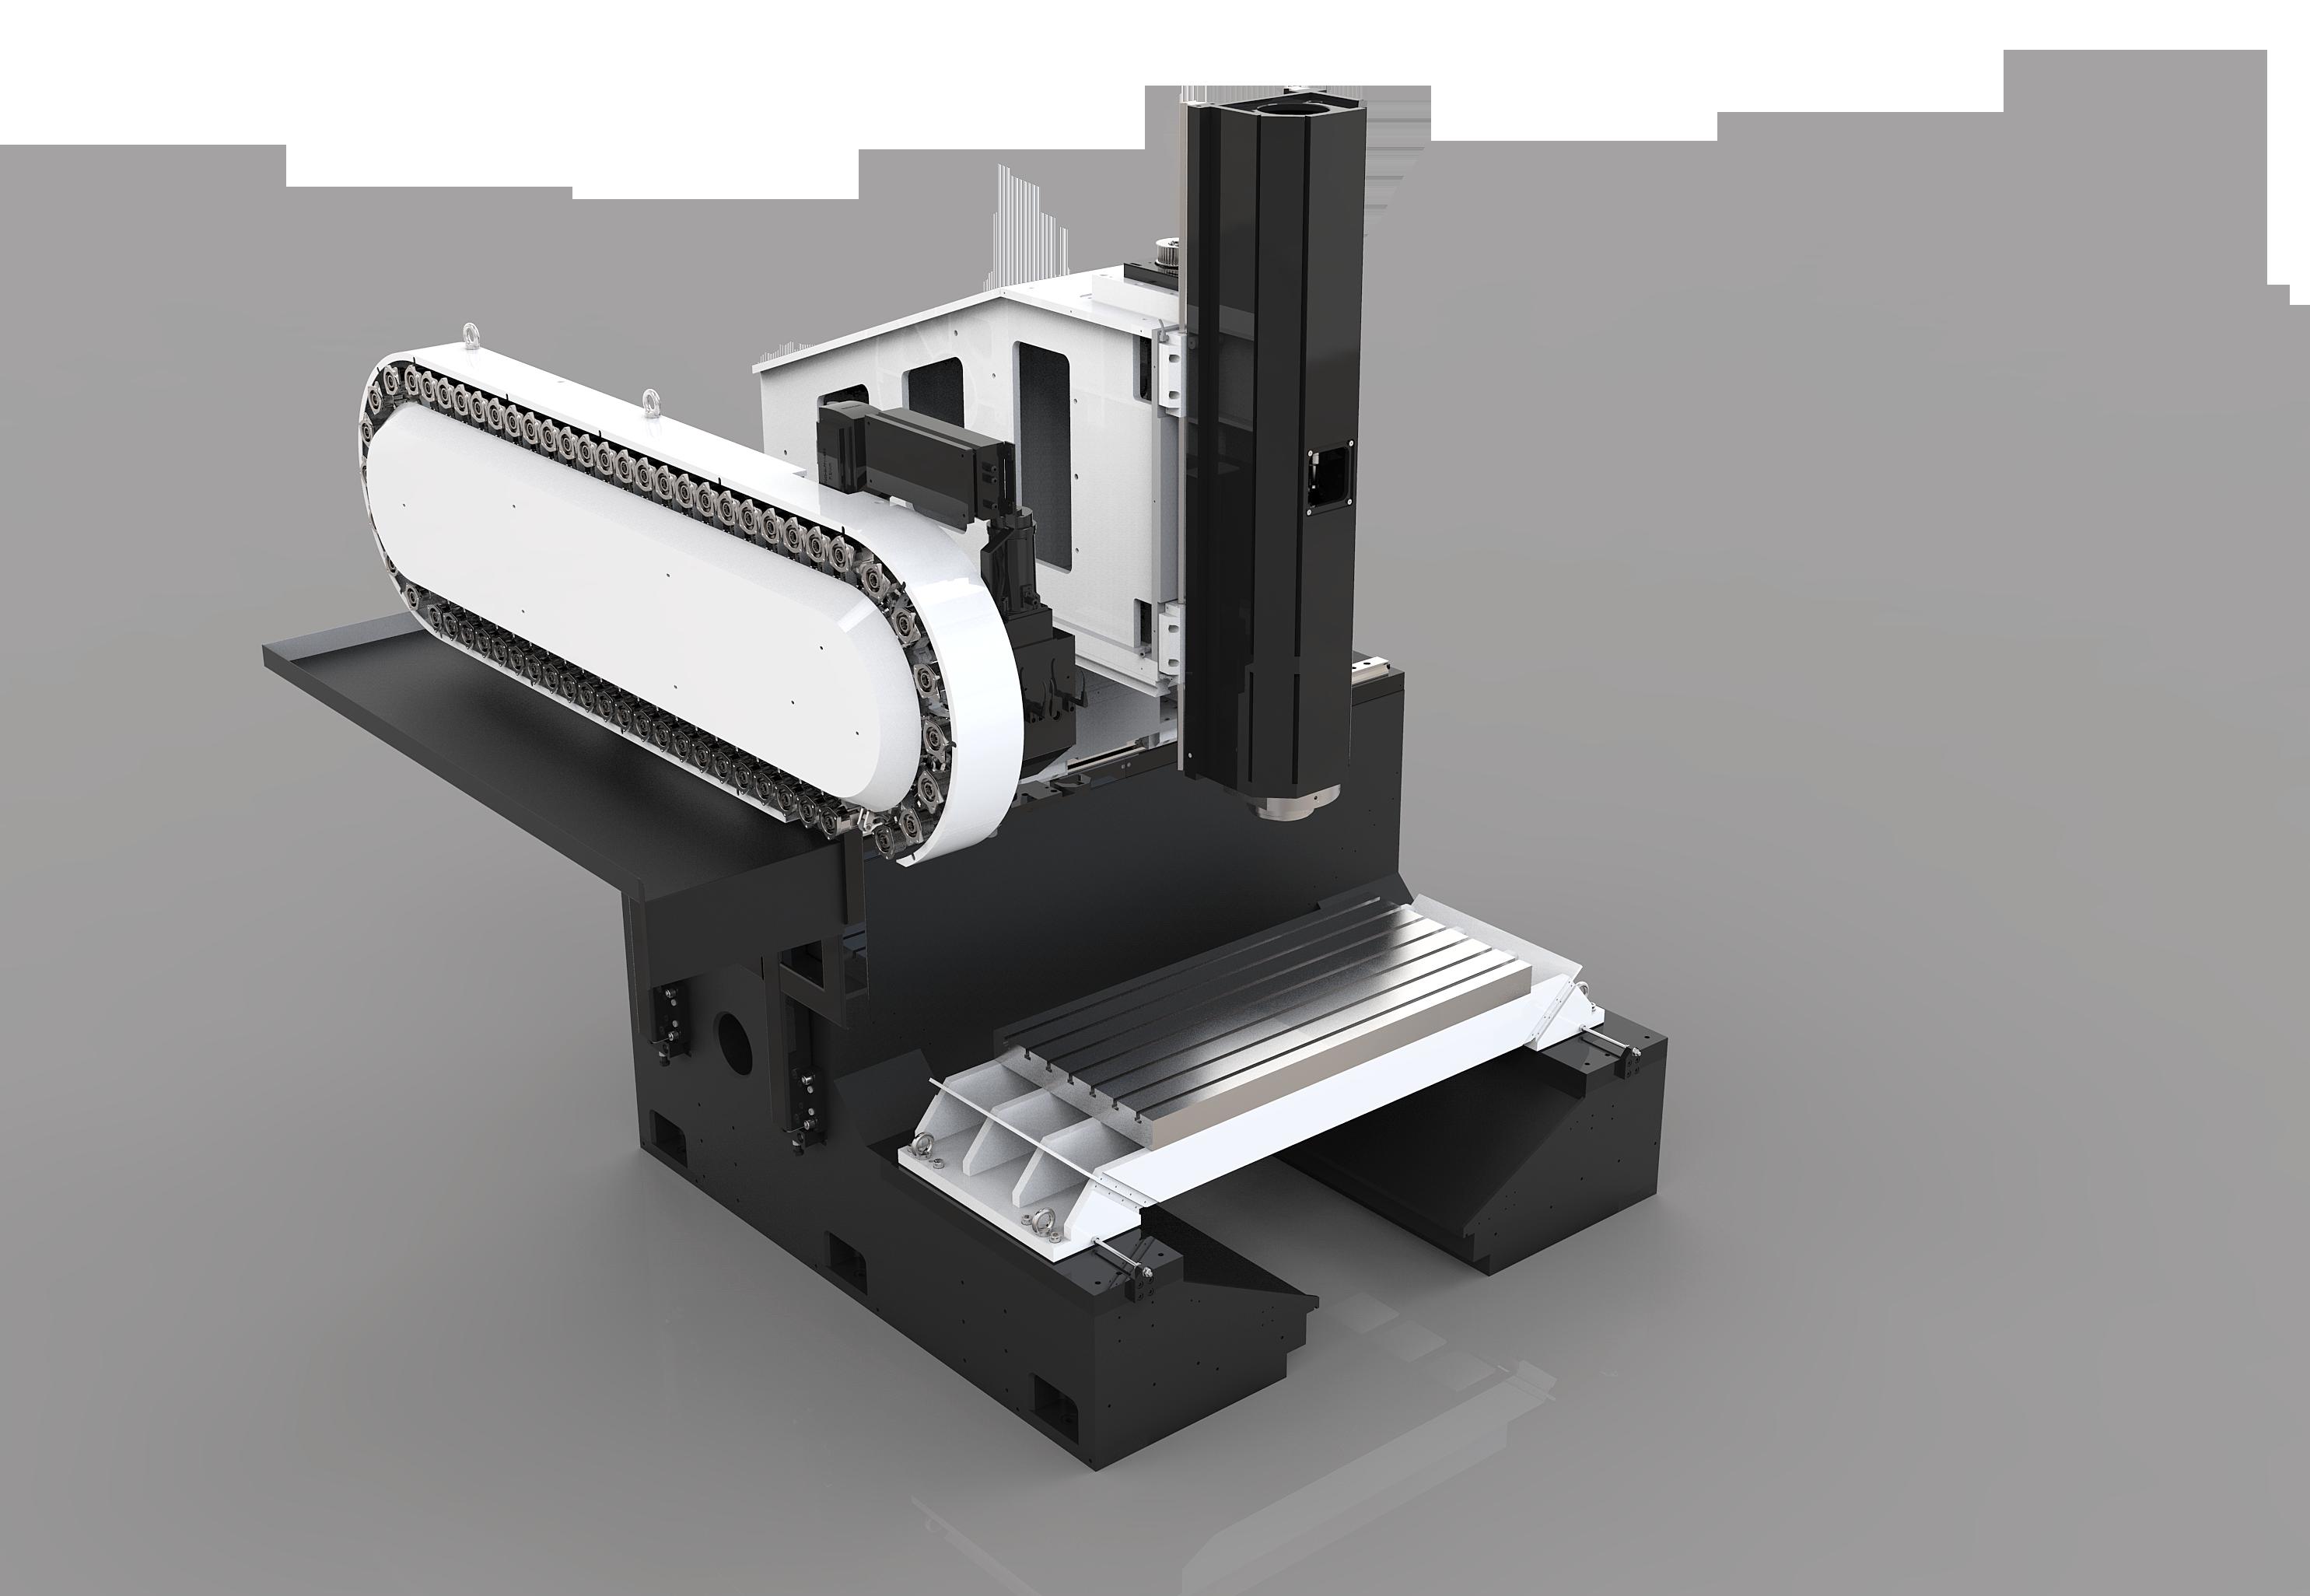 3/5-axis Cnc Machine 1100-3 Manufacturers, 3/5-axis Cnc Machine 1100-3 Factory, Supply 3/5-axis Cnc Machine 1100-3